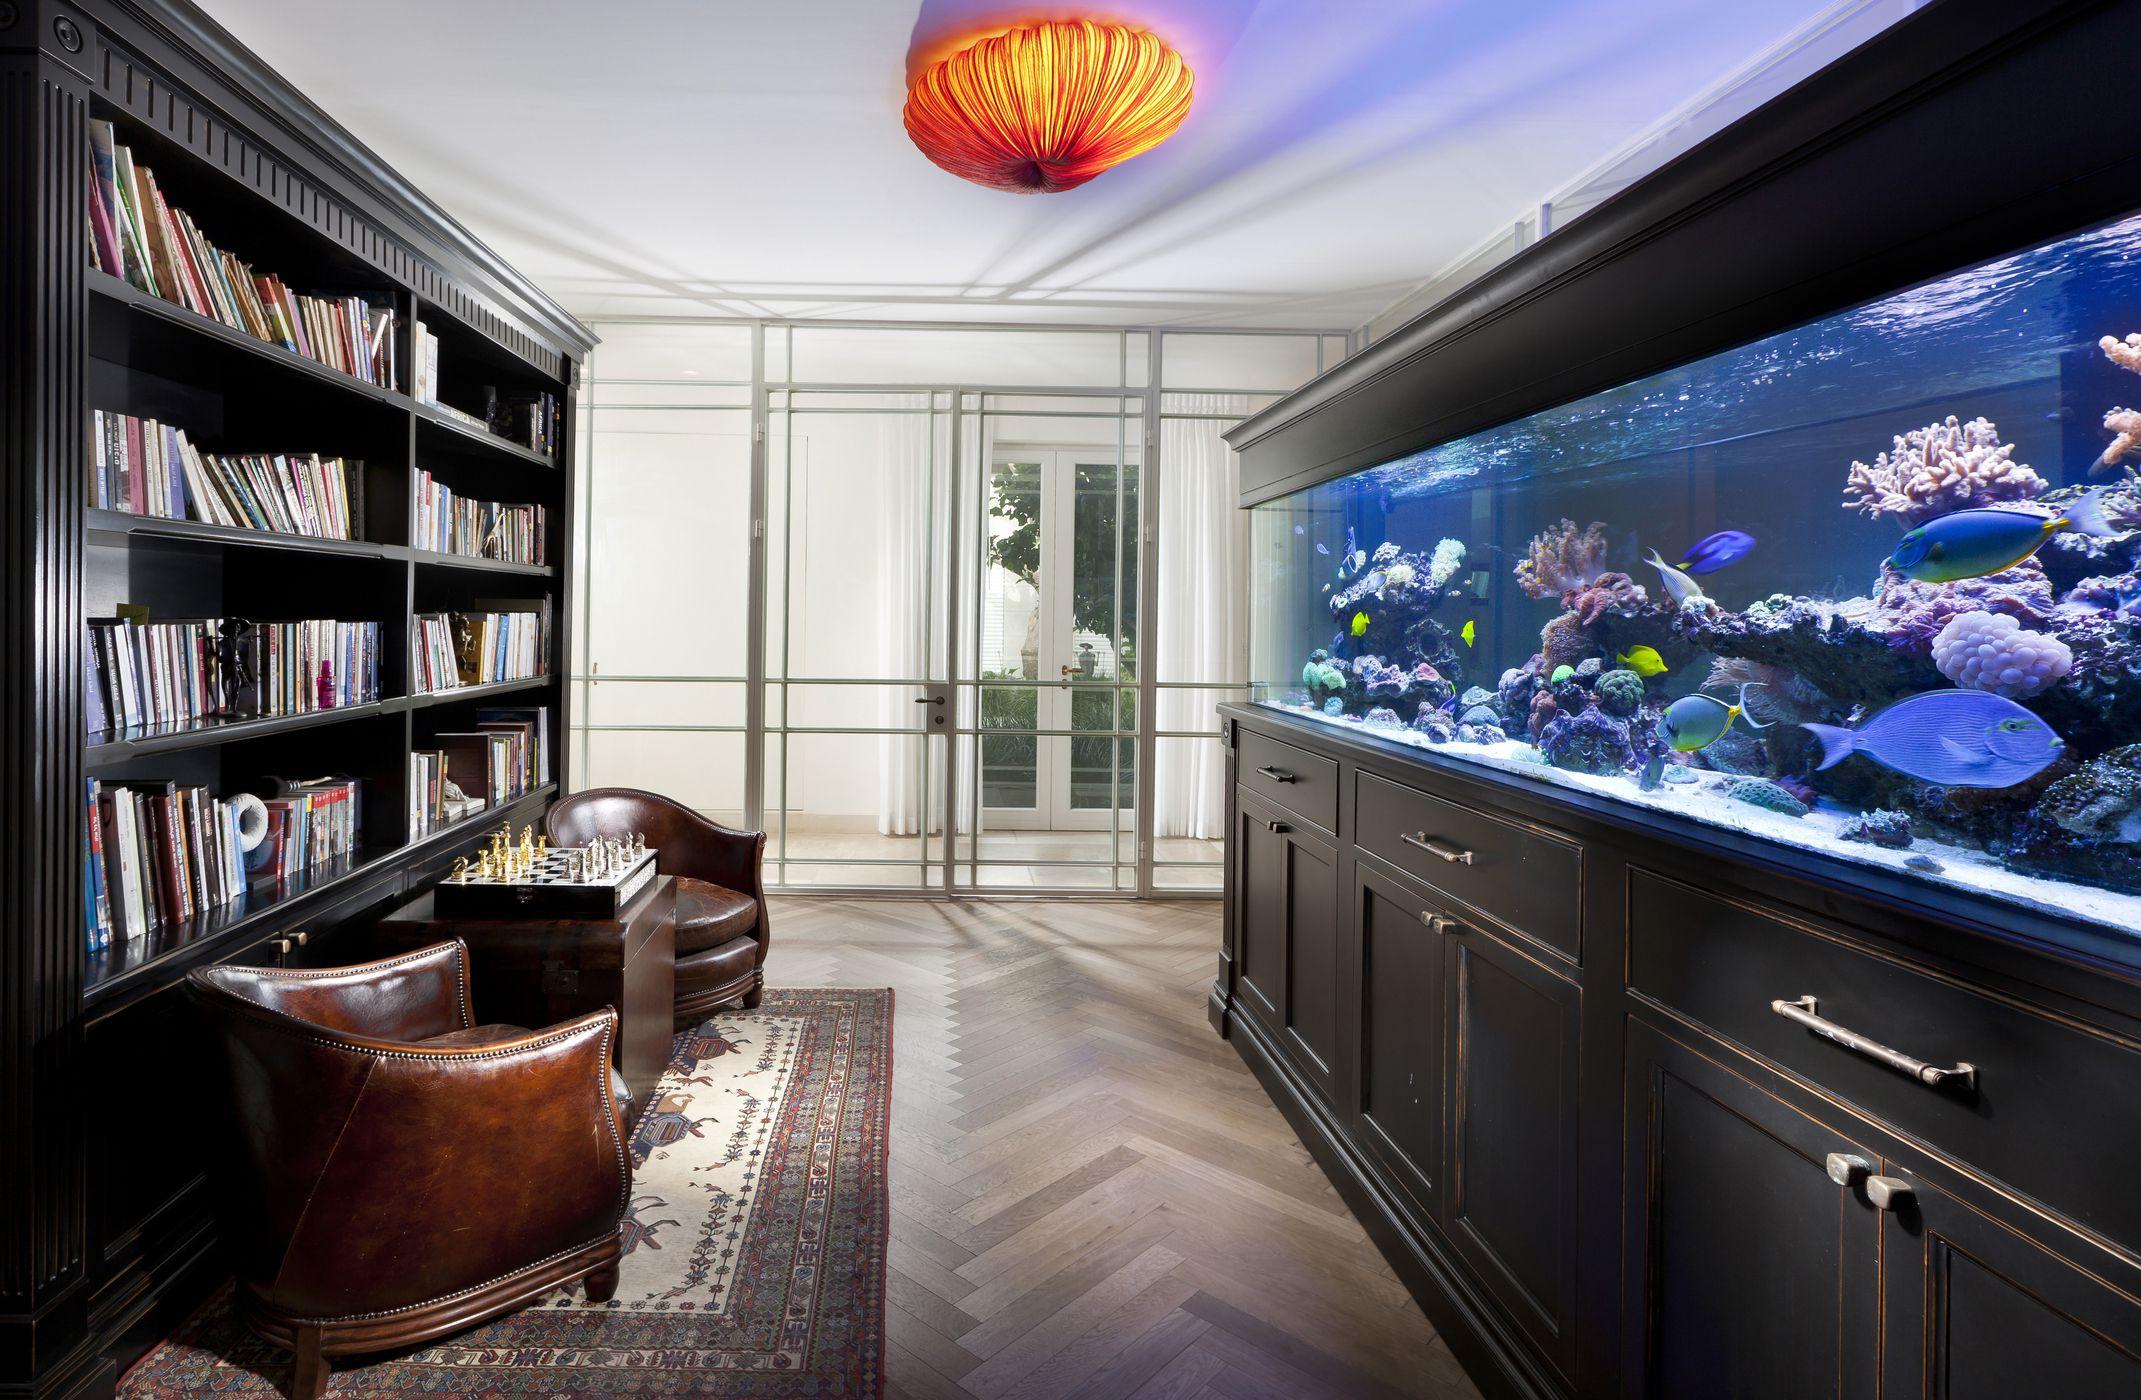 Top 9 Under Aquarium Cabinet WetDry Filter Setups